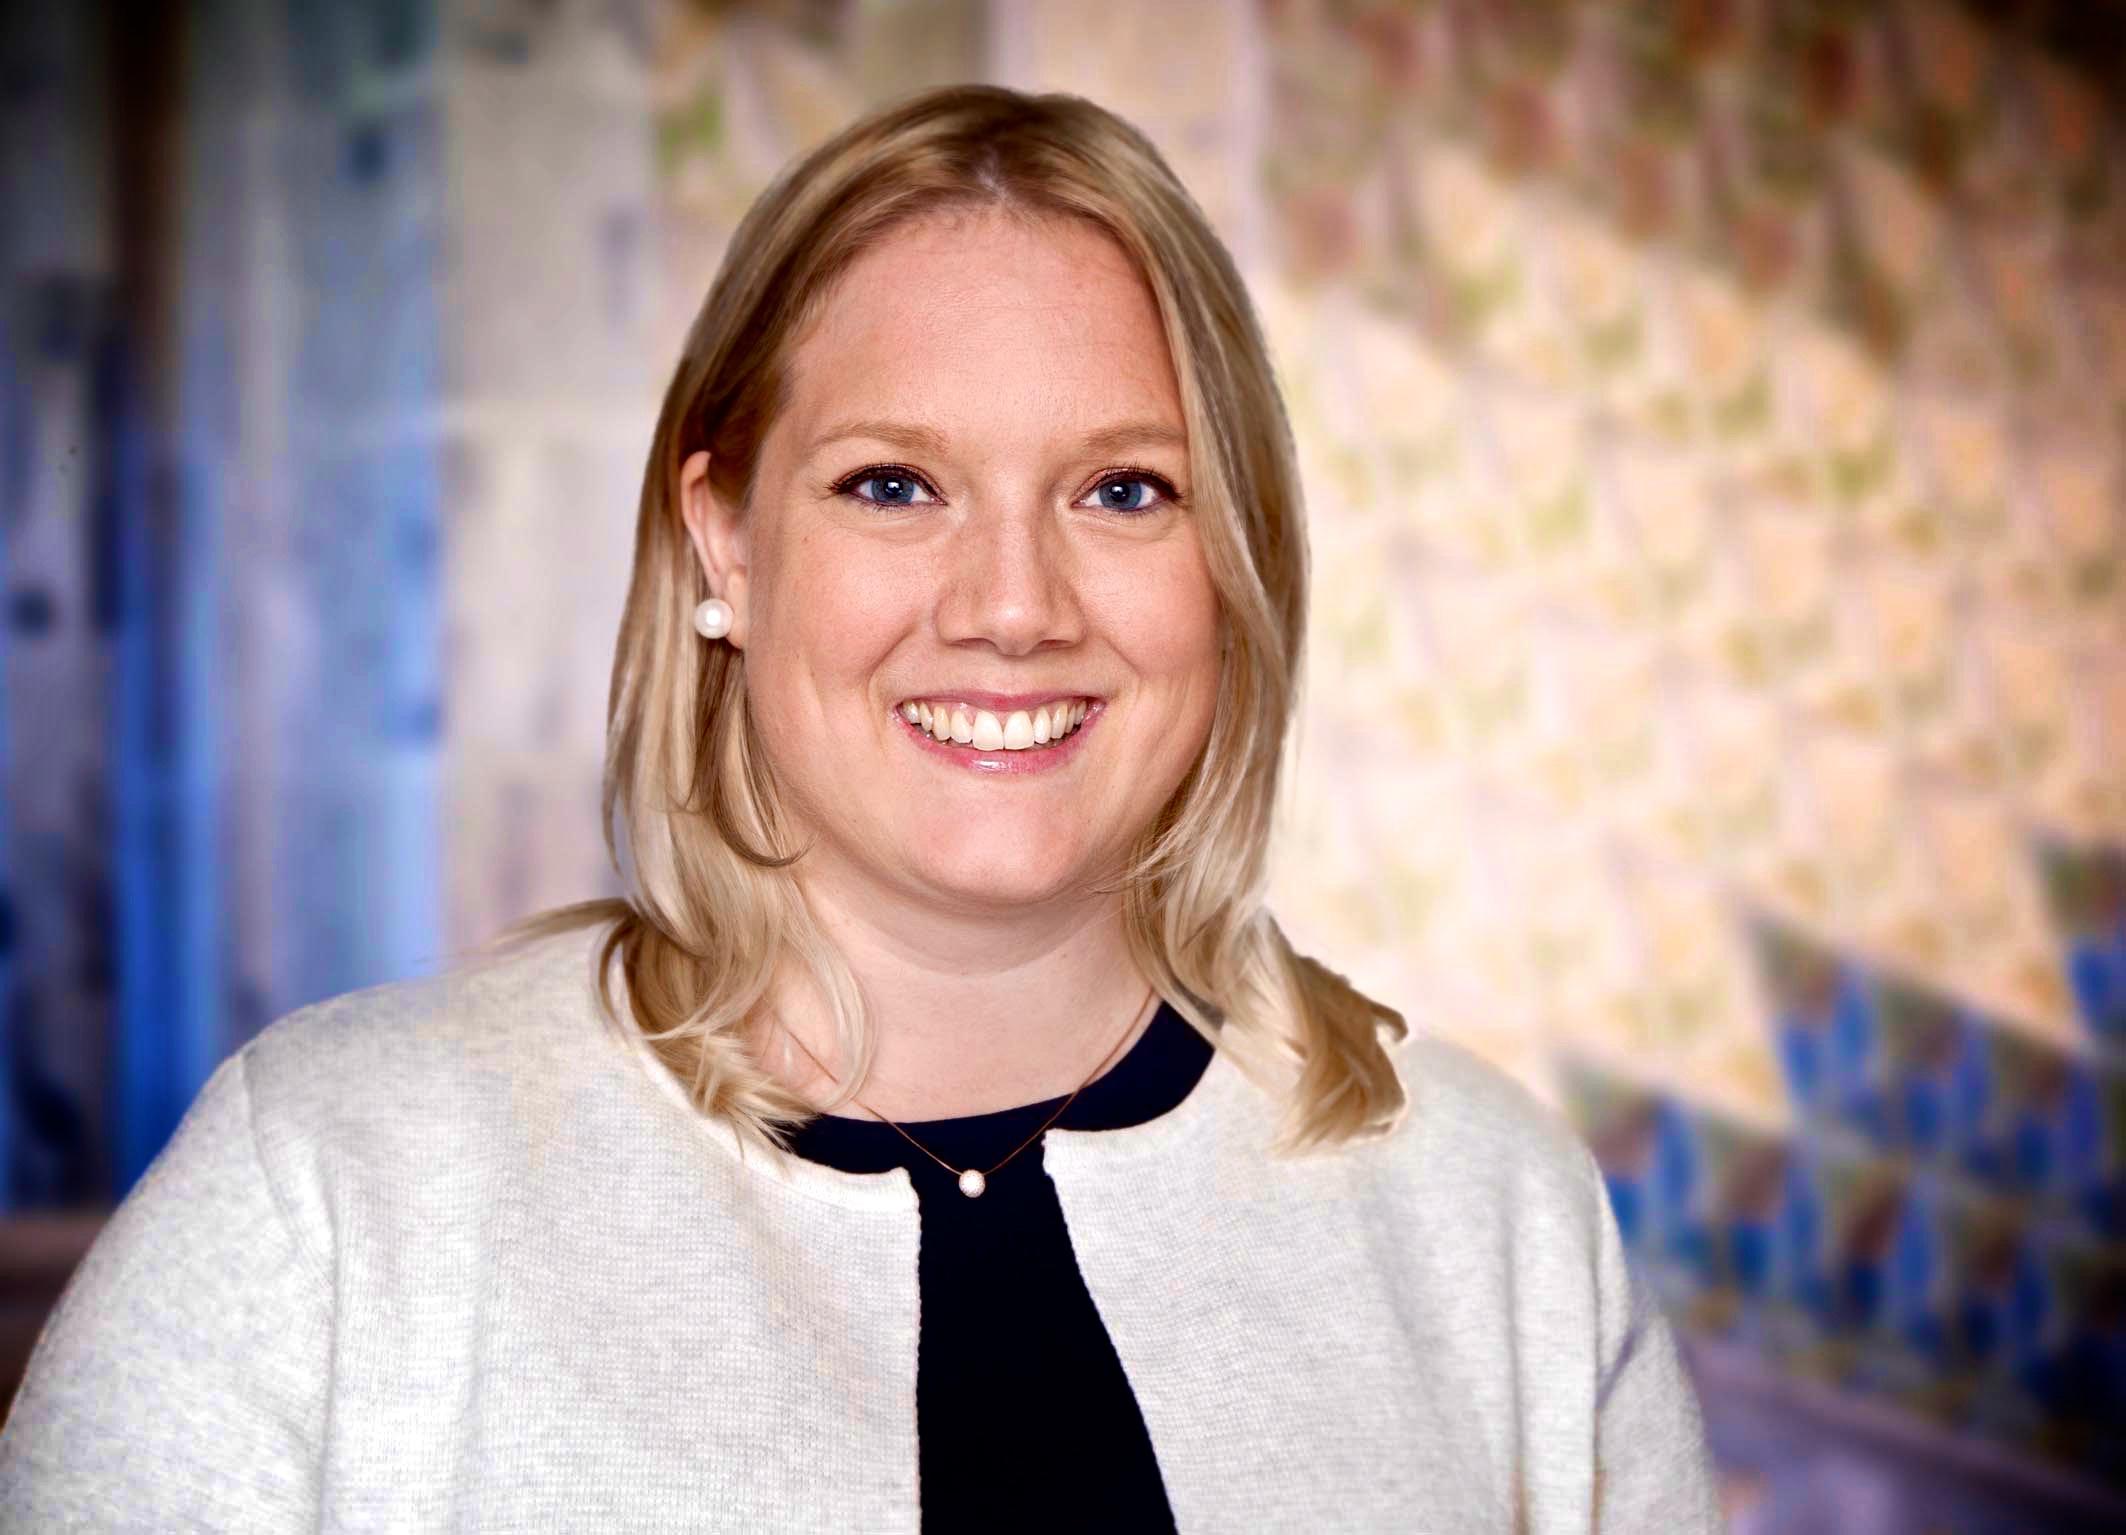 Aina Stenersen